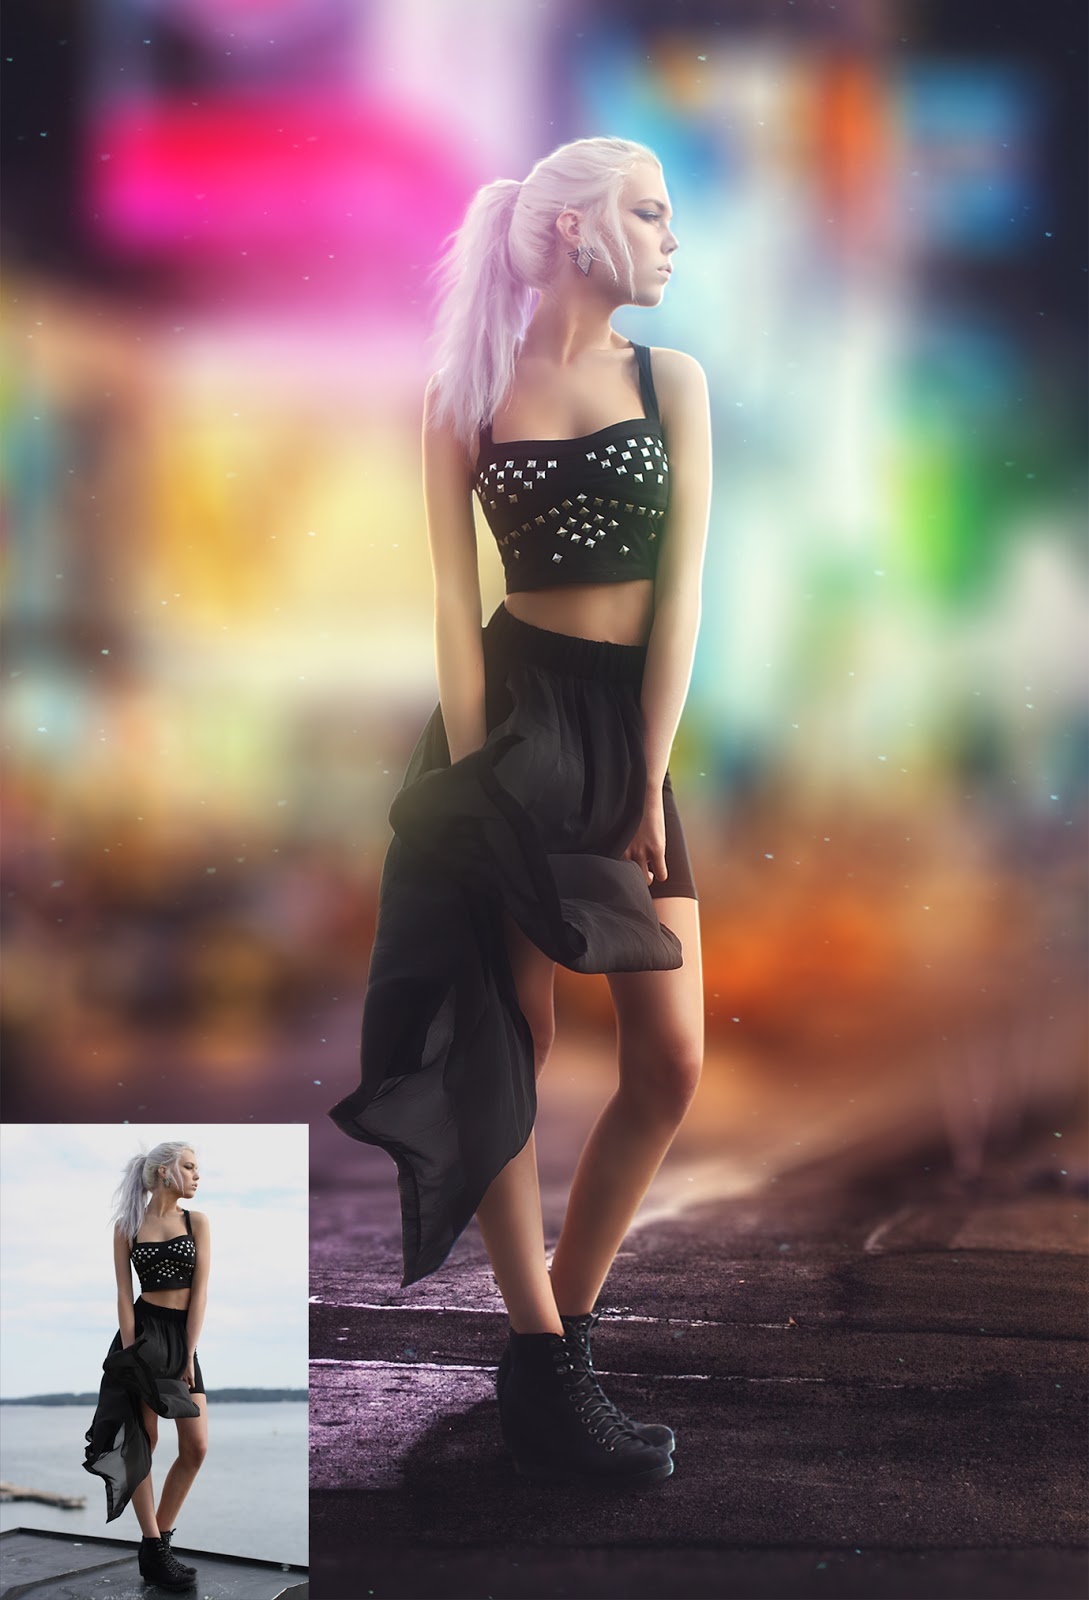 City night background effect photoshop tutorial rafy a city night background effect photoshop tutorial baditri Image collections